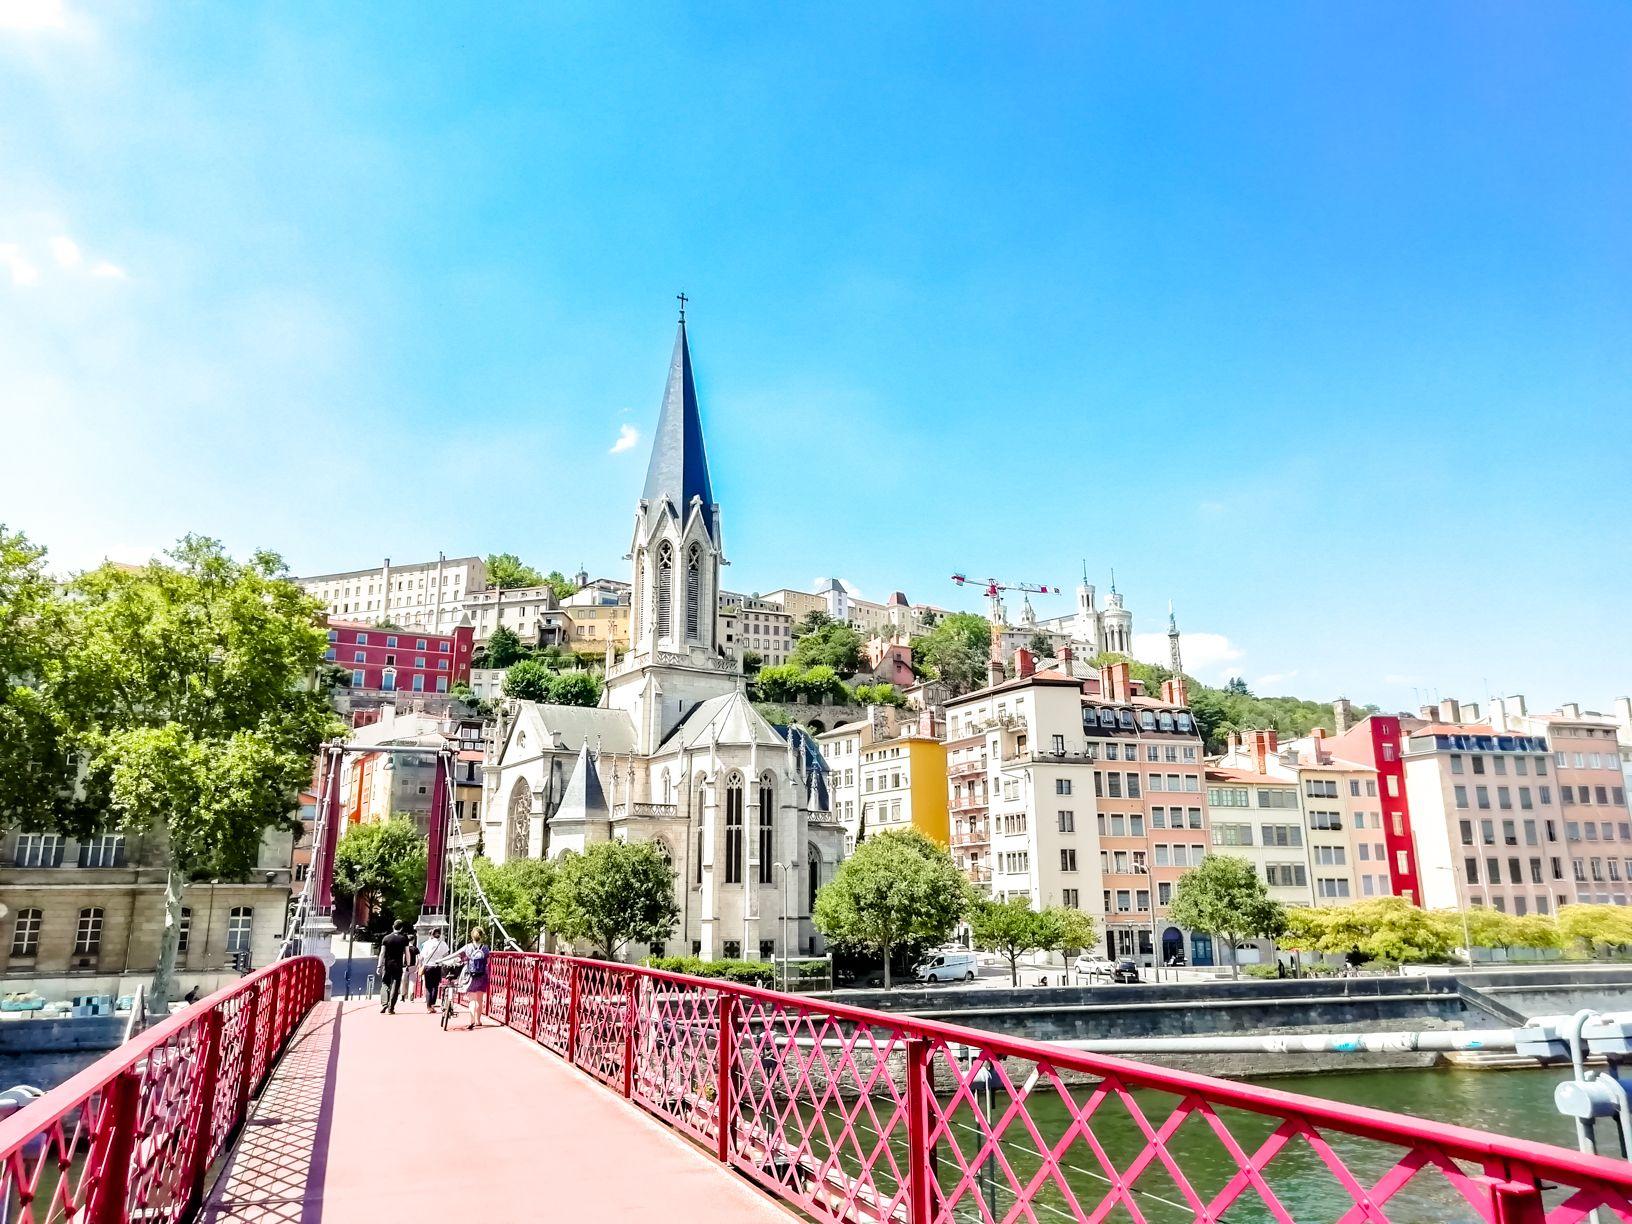 Saint George Church from Passerelle St Georges Bridge | Short travel guide to Lyon, France | FinnsAway Travel Blog